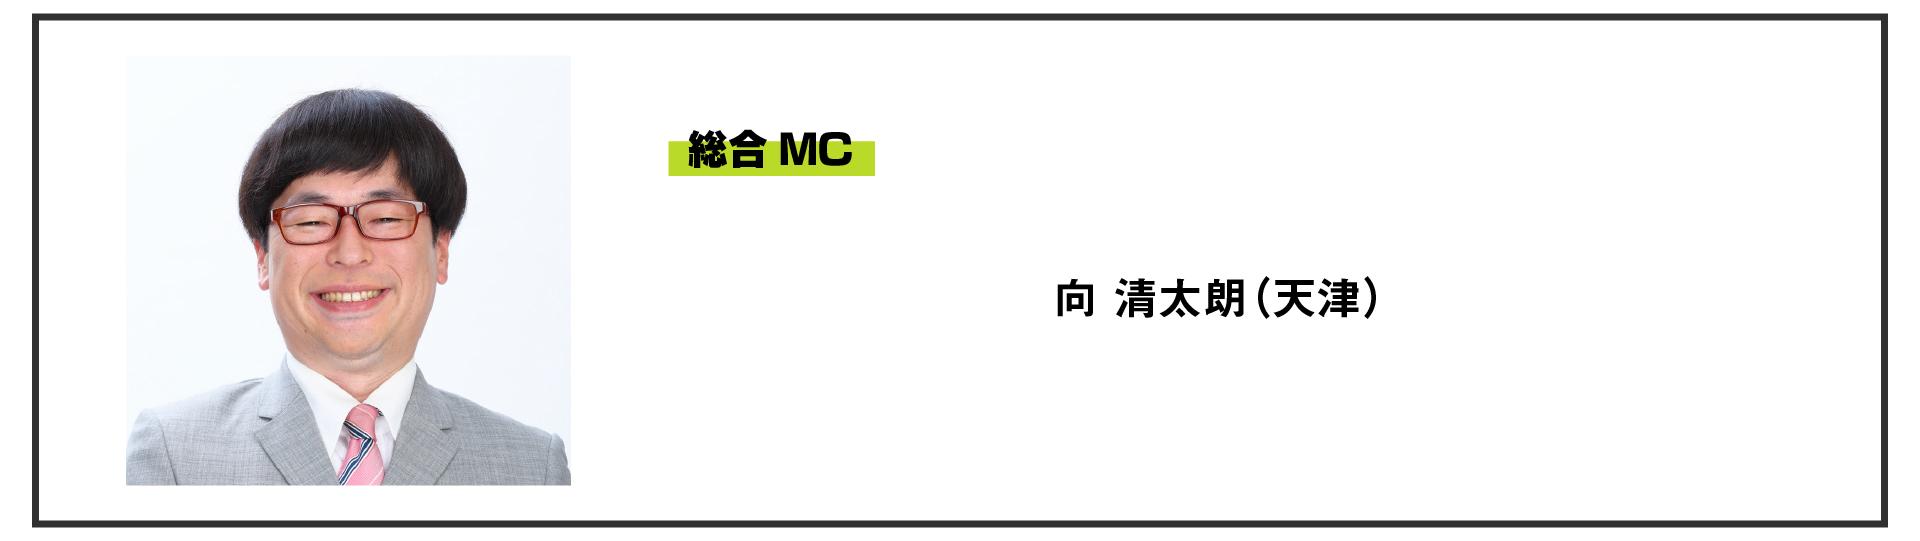 「MAPPA STAGE 2021 -10th Anniversary-」総合MC:向清太朗さん(天津)